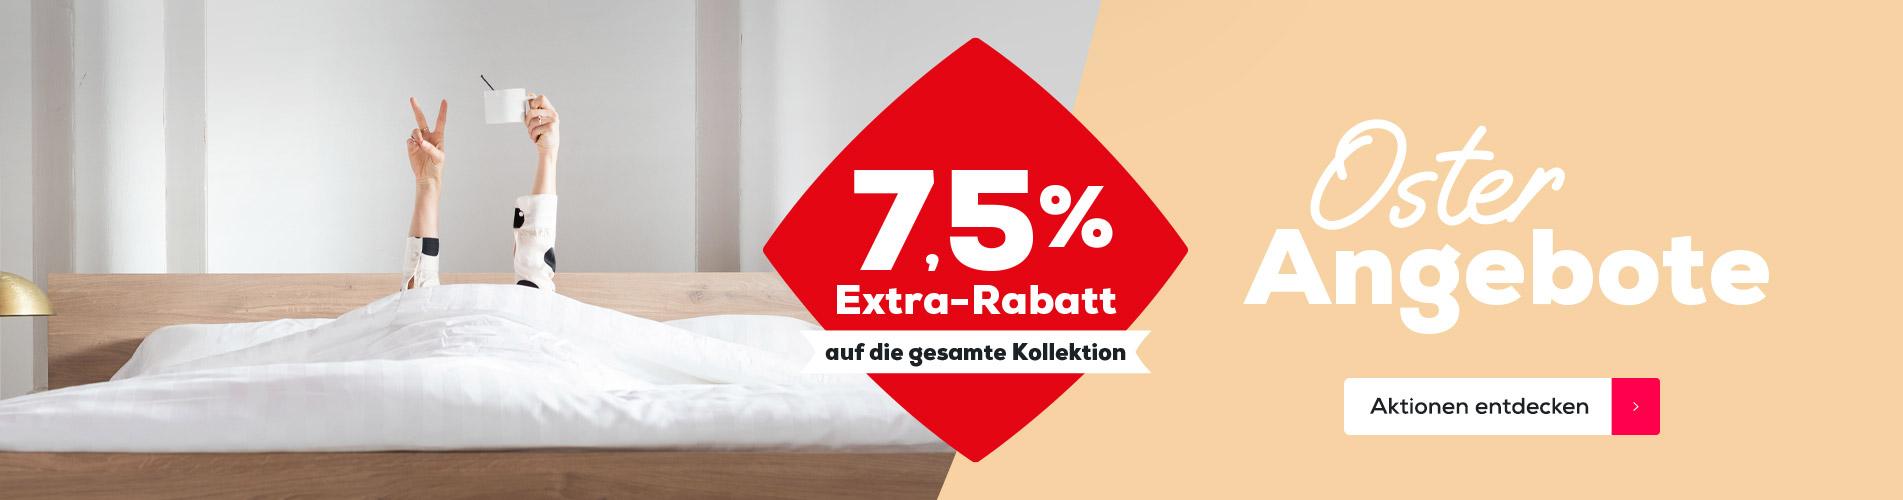 Oster Angebote| Swiss Sense